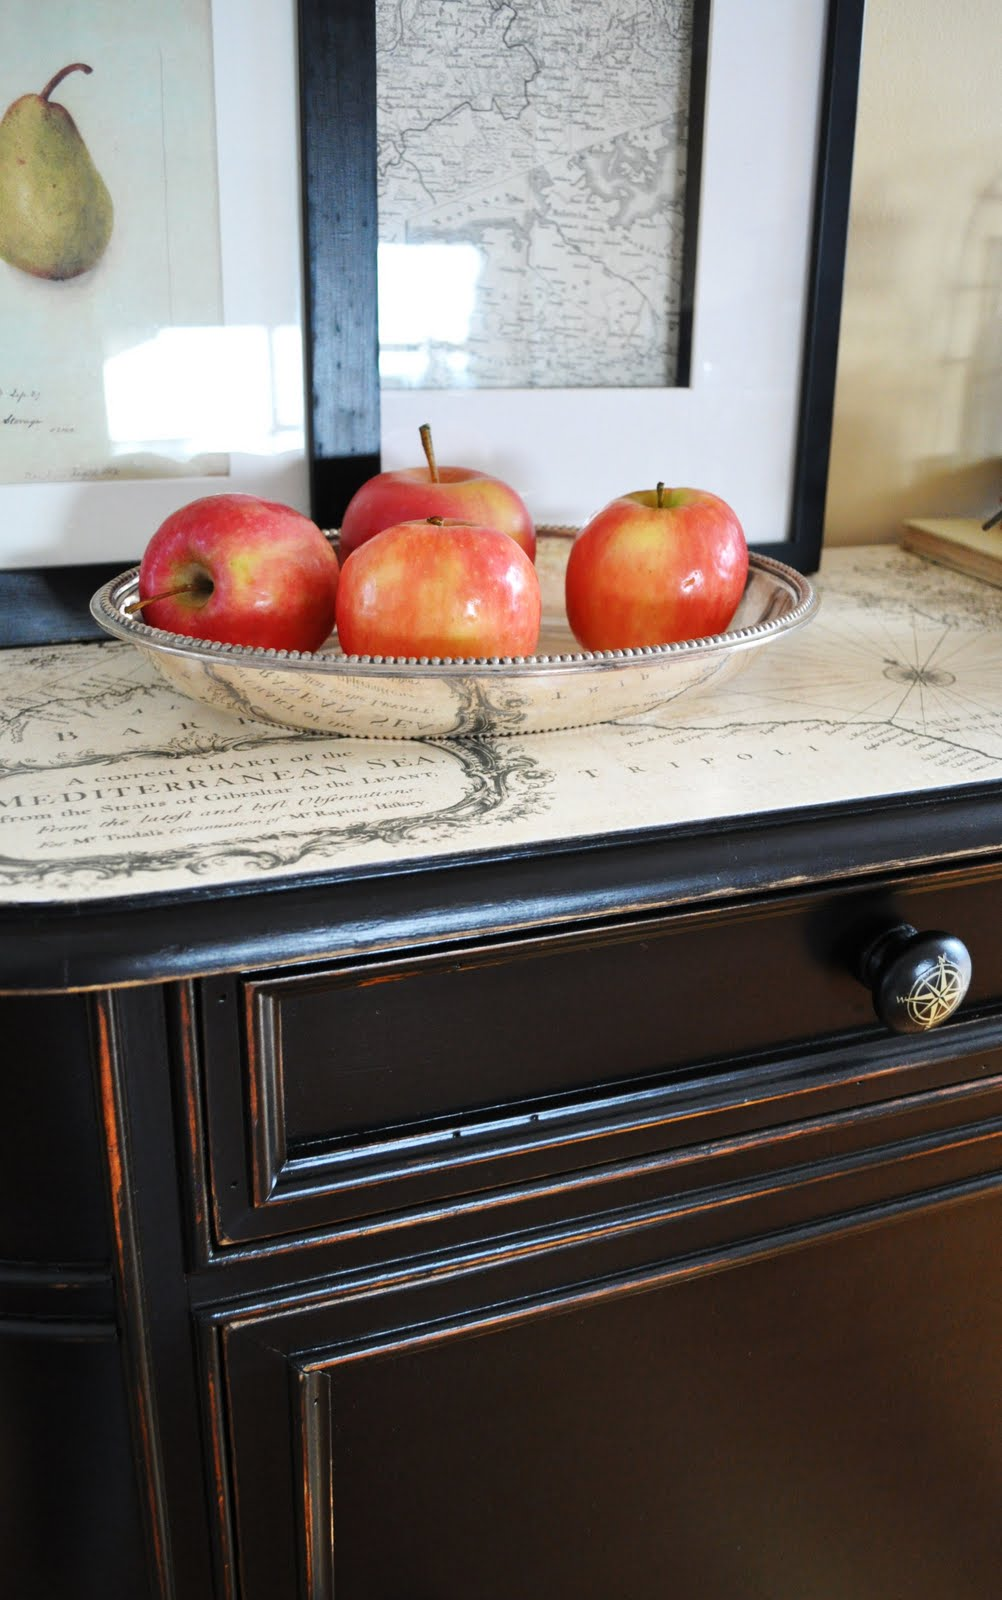 Decoupage Kitchen Cabinets Decoupage A Table With Sheet Music Decoupage Kitchen Table